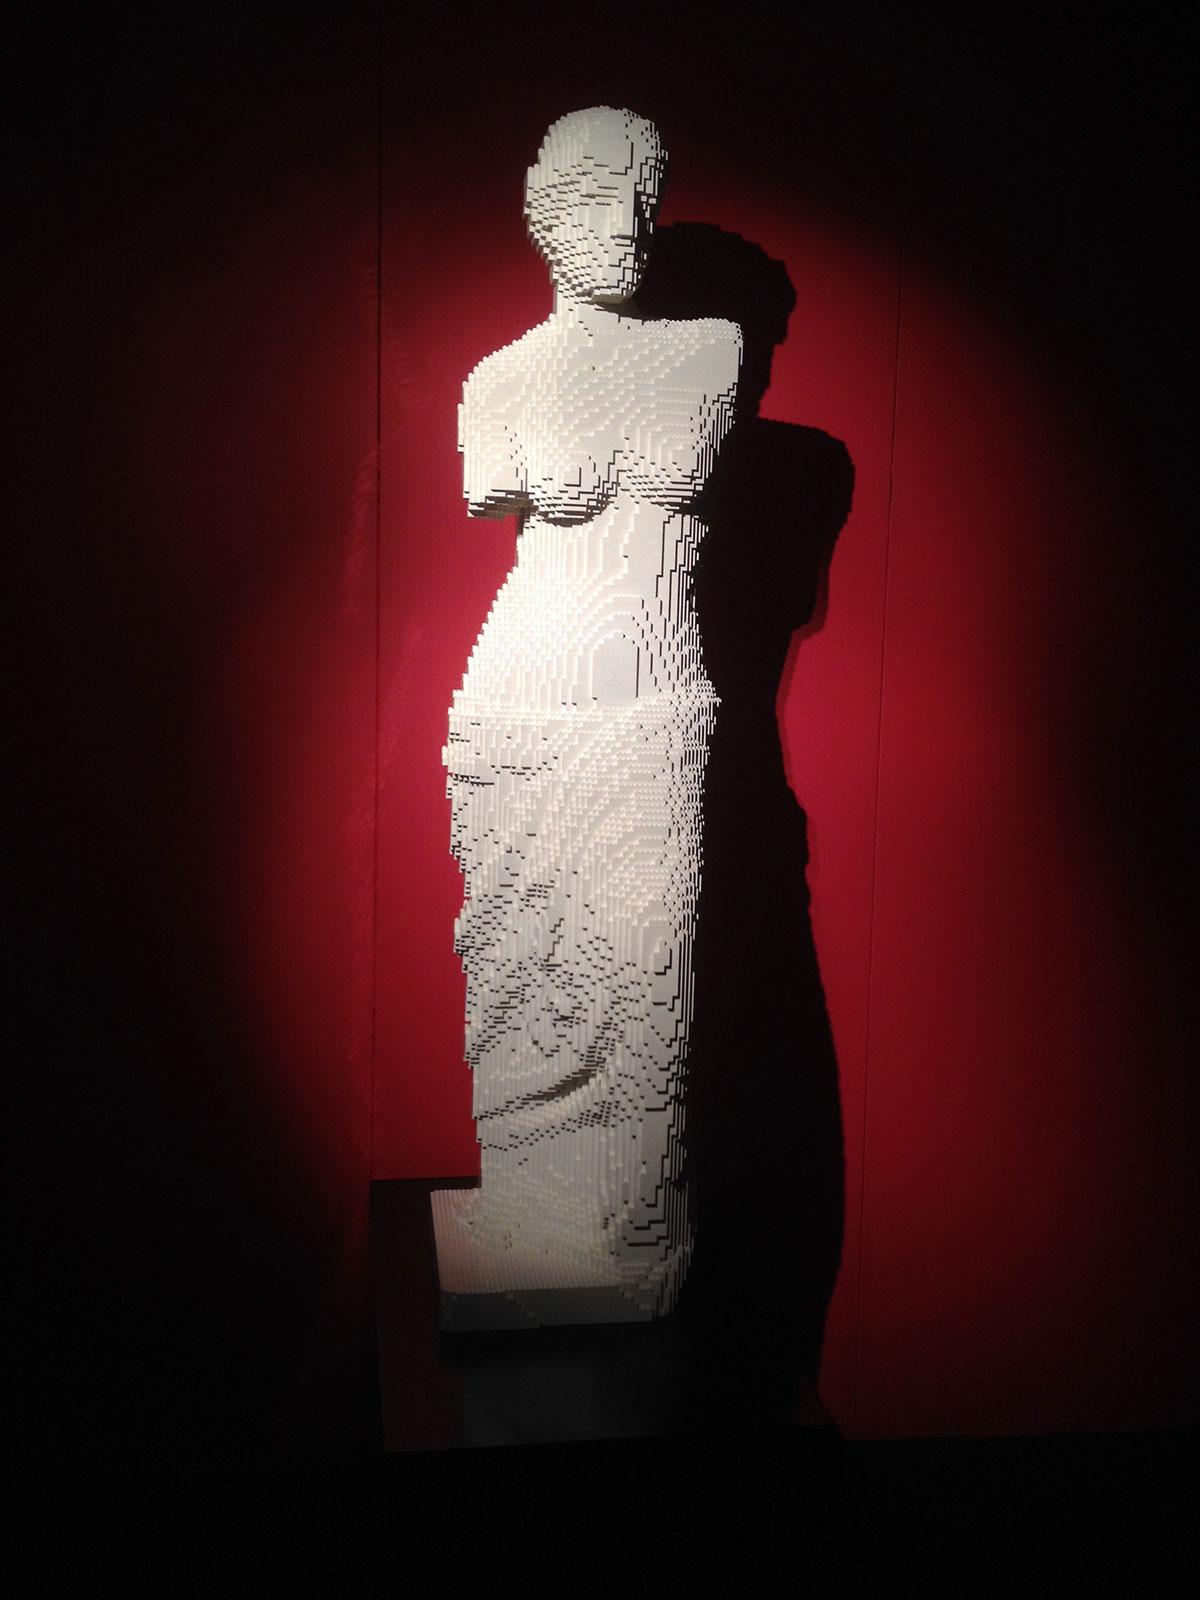 LEGO statue